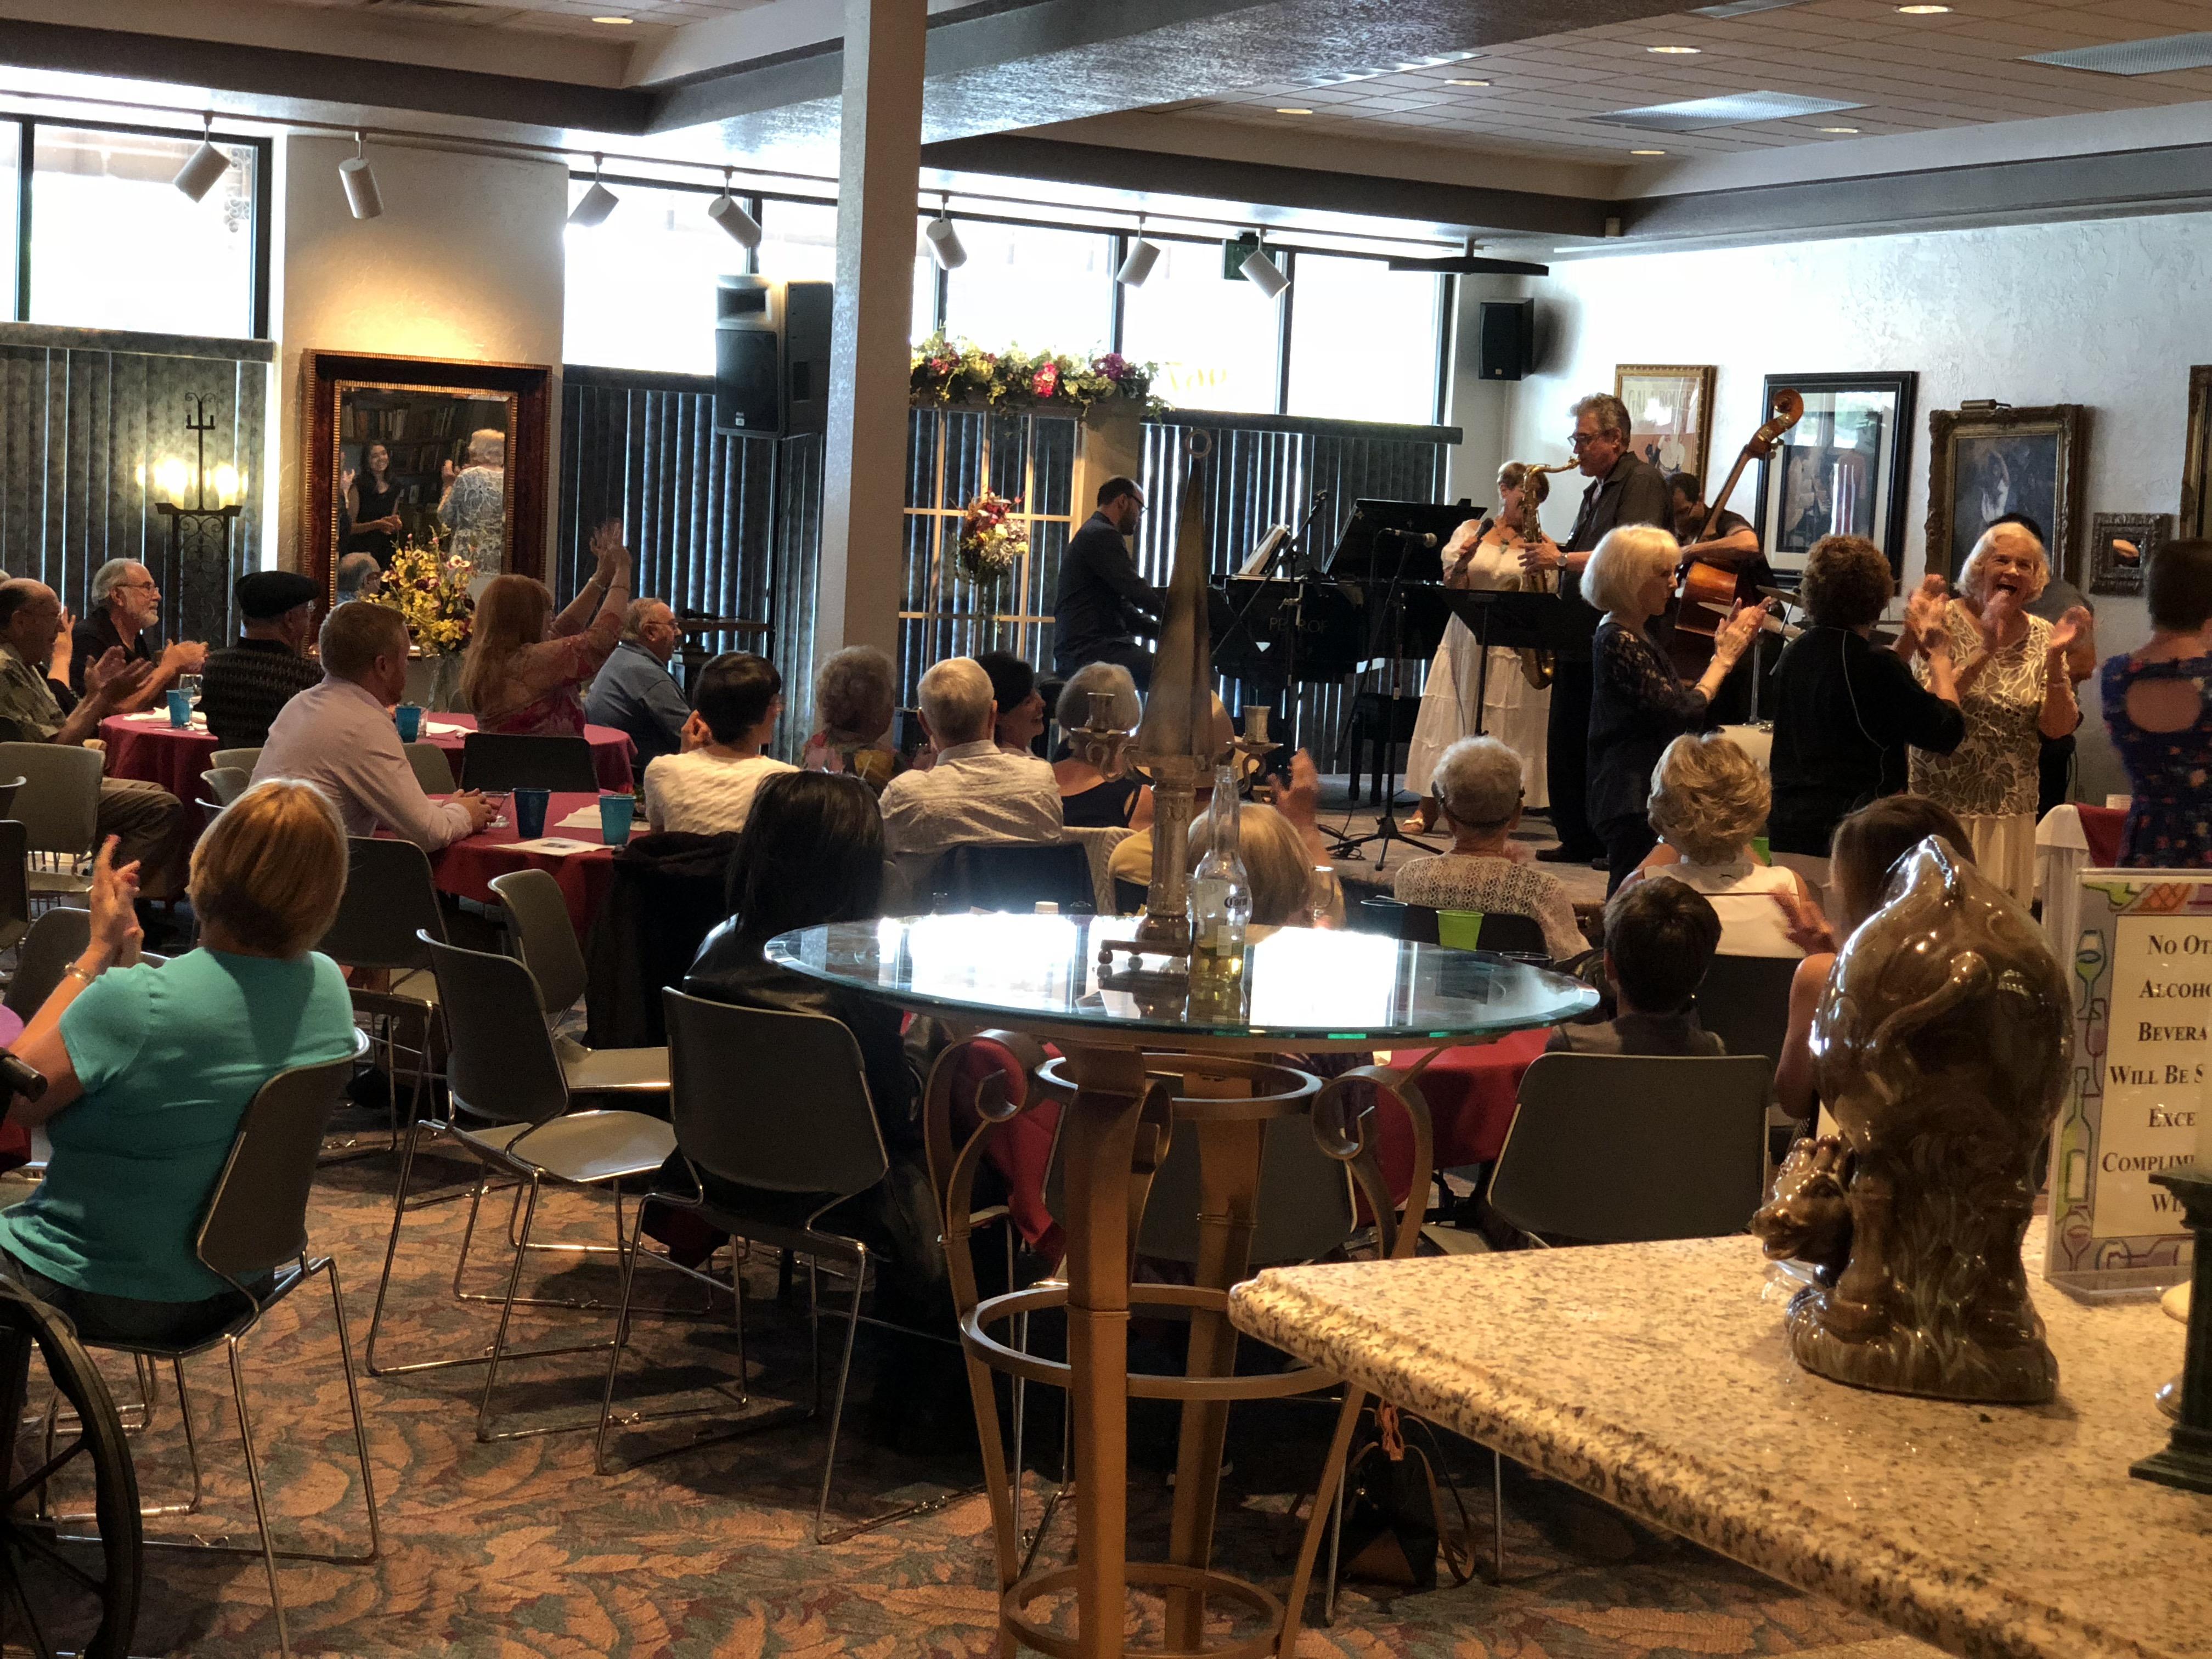 Colorado Springs Reception Center